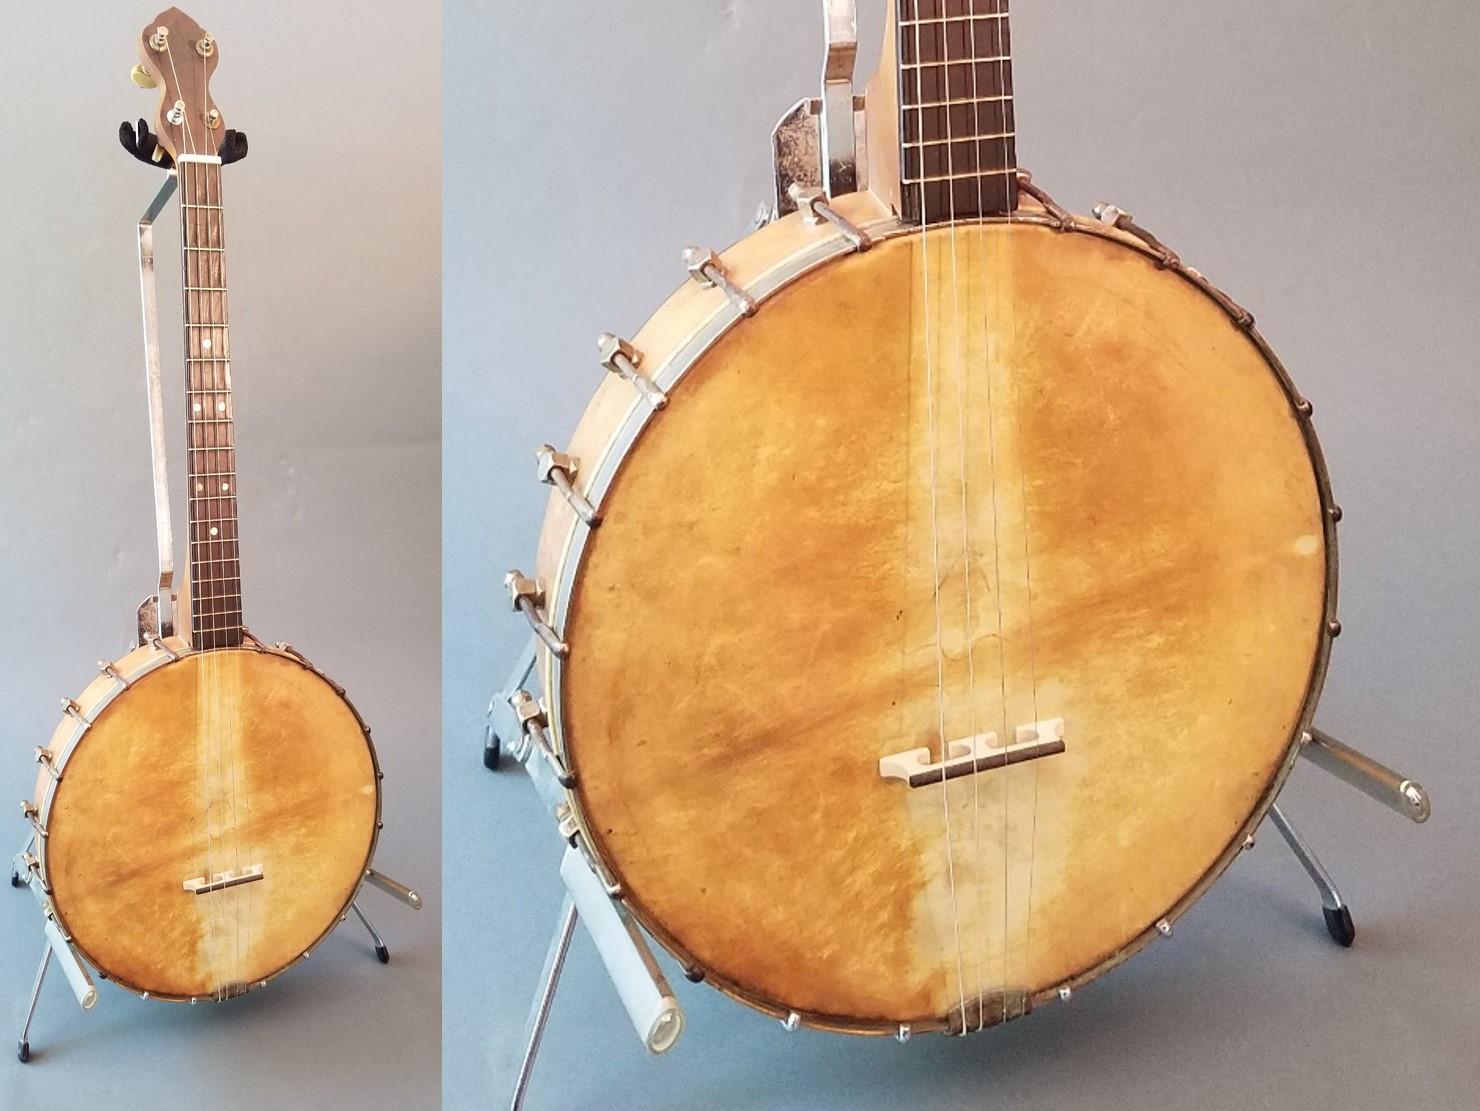 Vintage Concertone - Concertone open-back Irish tenor banjo - Natural-skin head! circa 1920's!$199